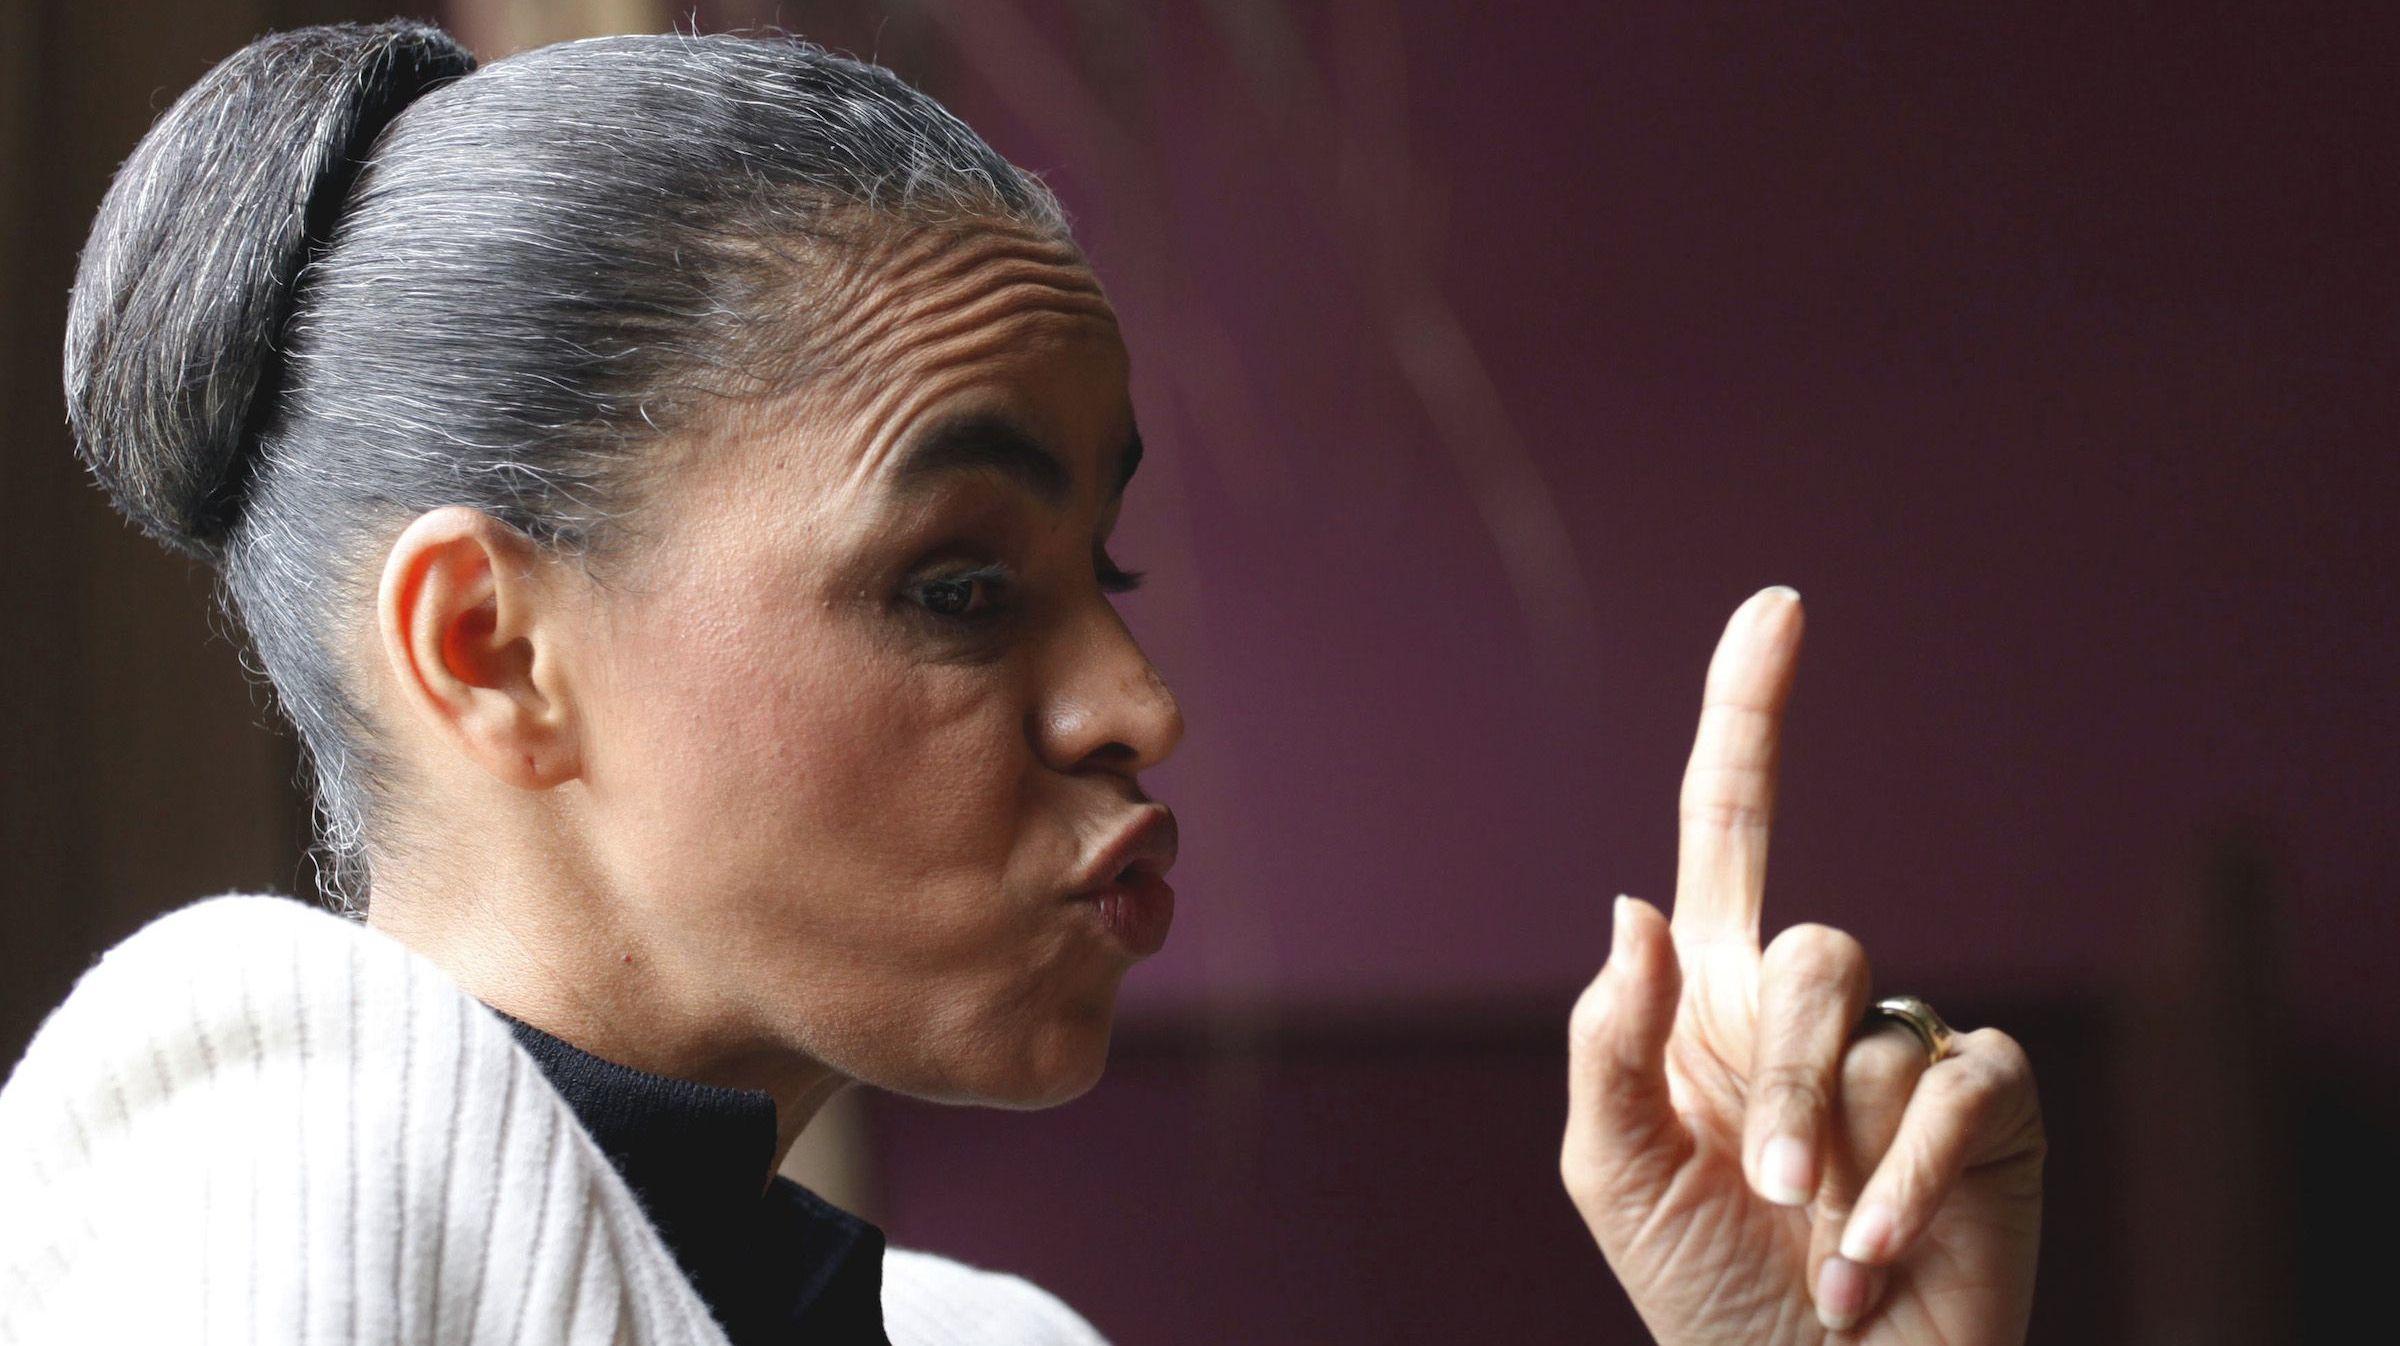 Marina Silva, running for president in Brazil in 2014, has a beauty hack